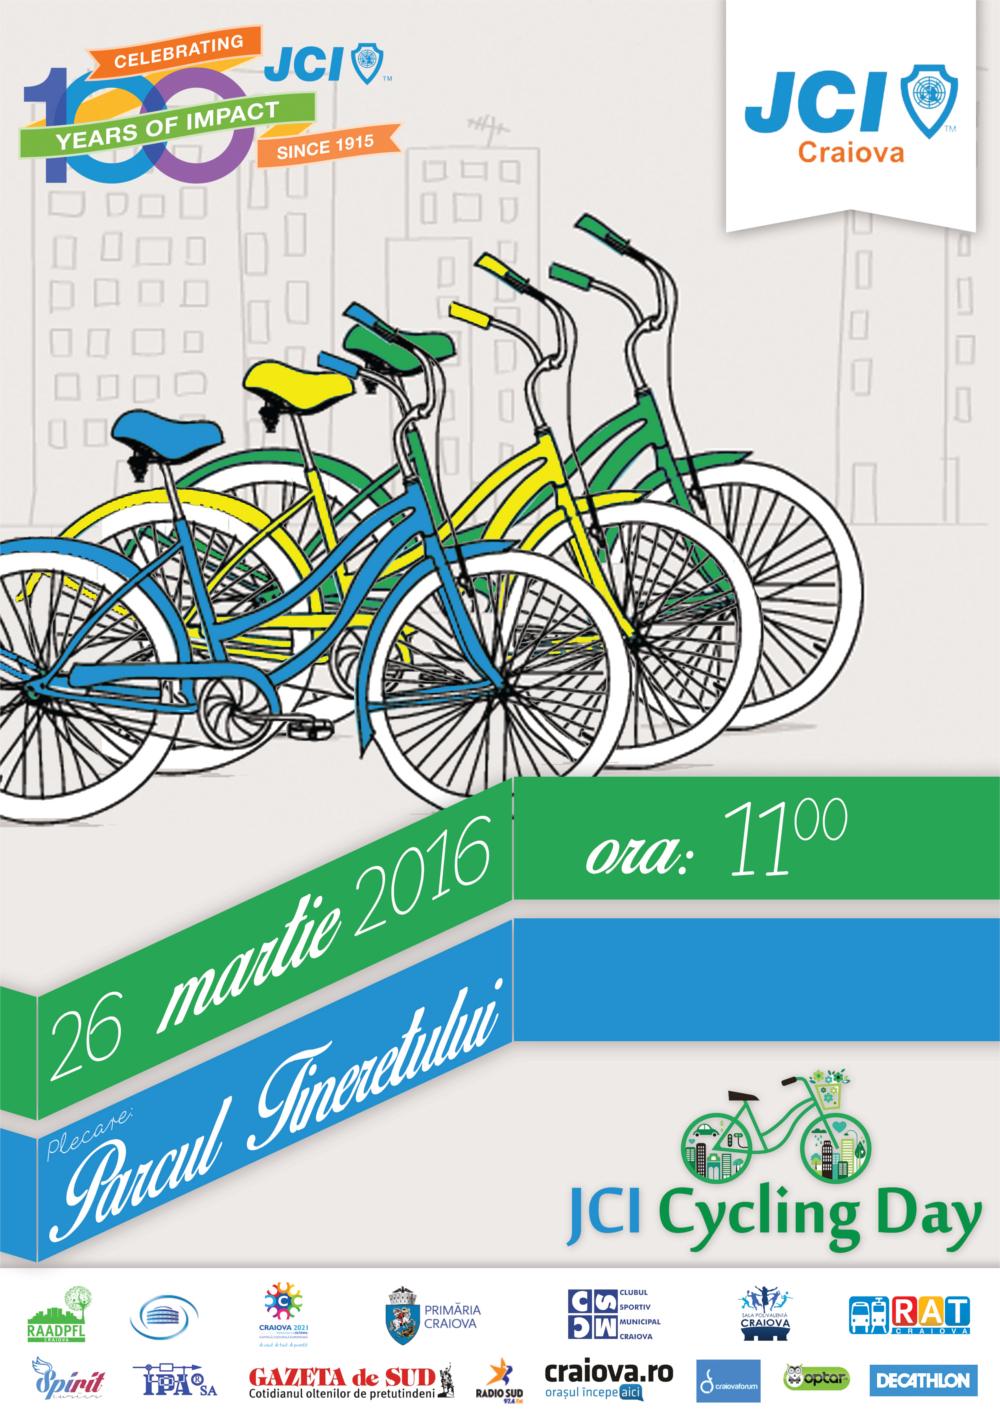 jcicraiova-cycling-day